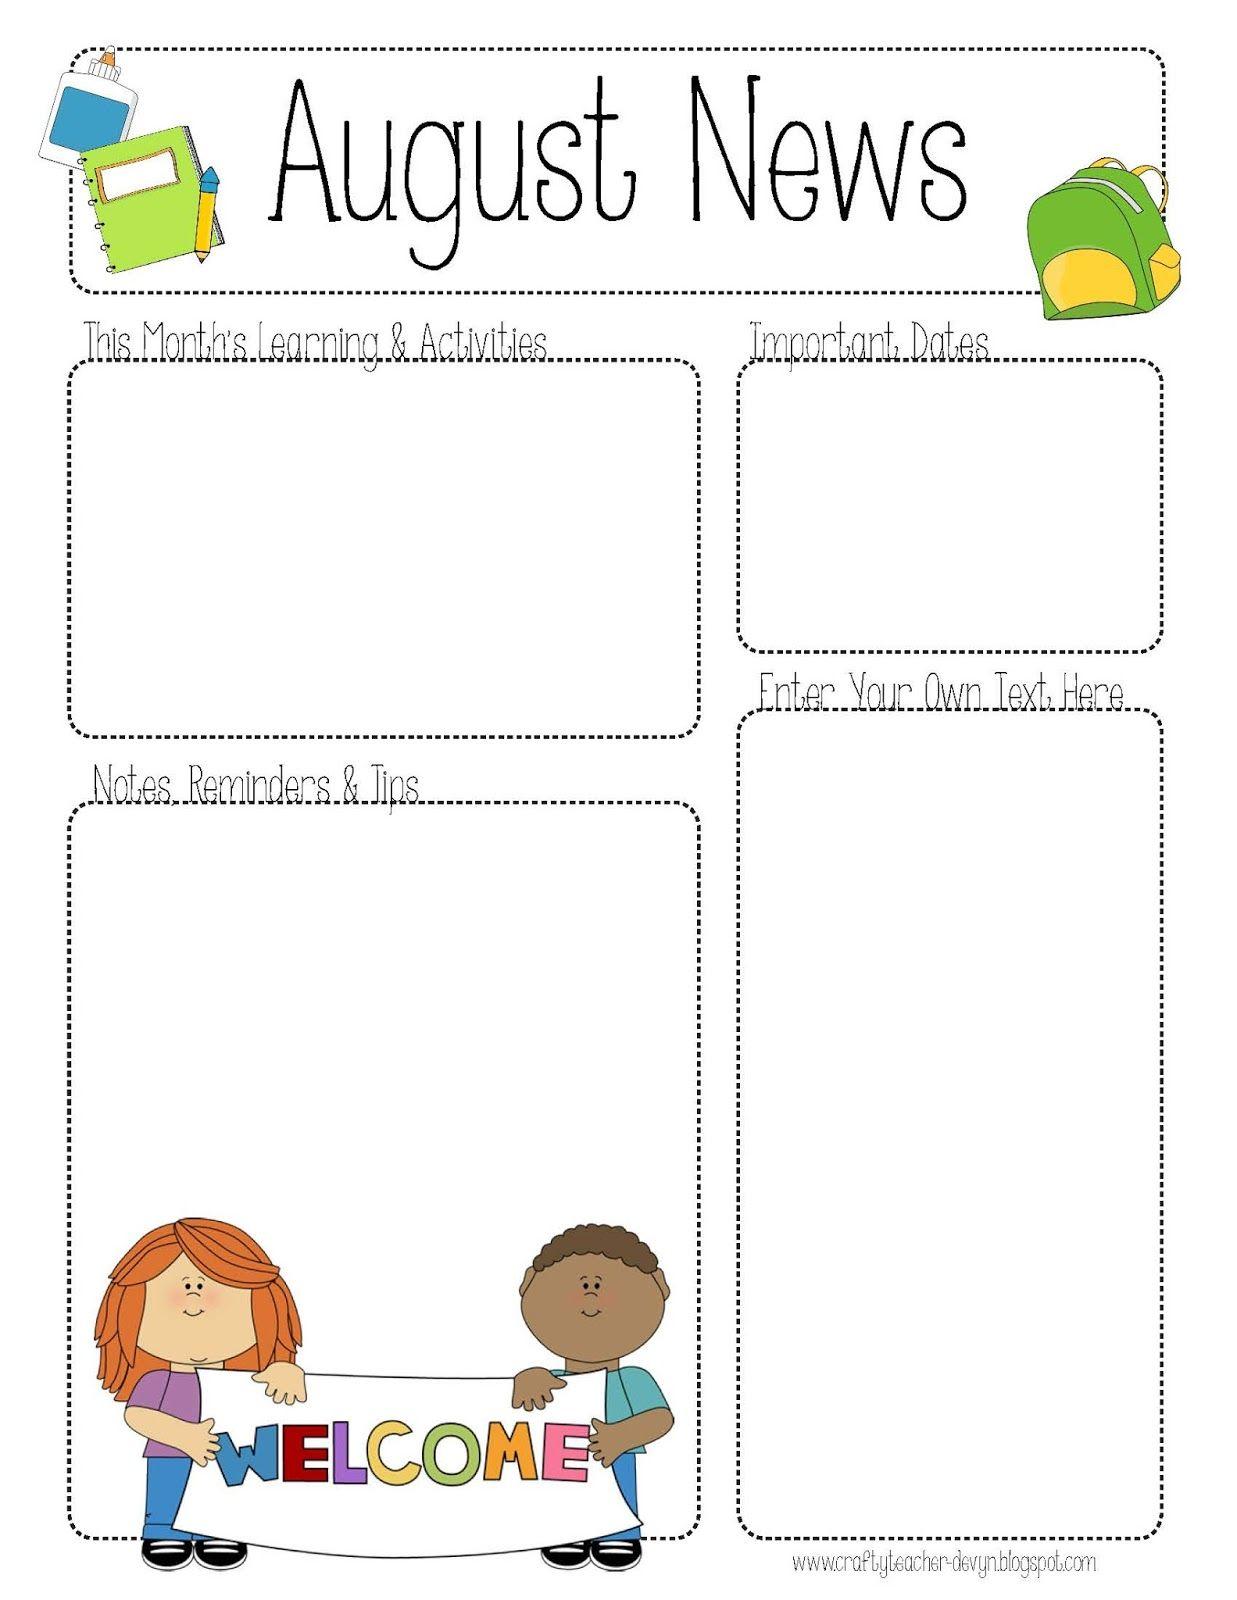 August Printable Newsletter For All Grades!! | Class Stuff regarding August Calendar Template For Pre K